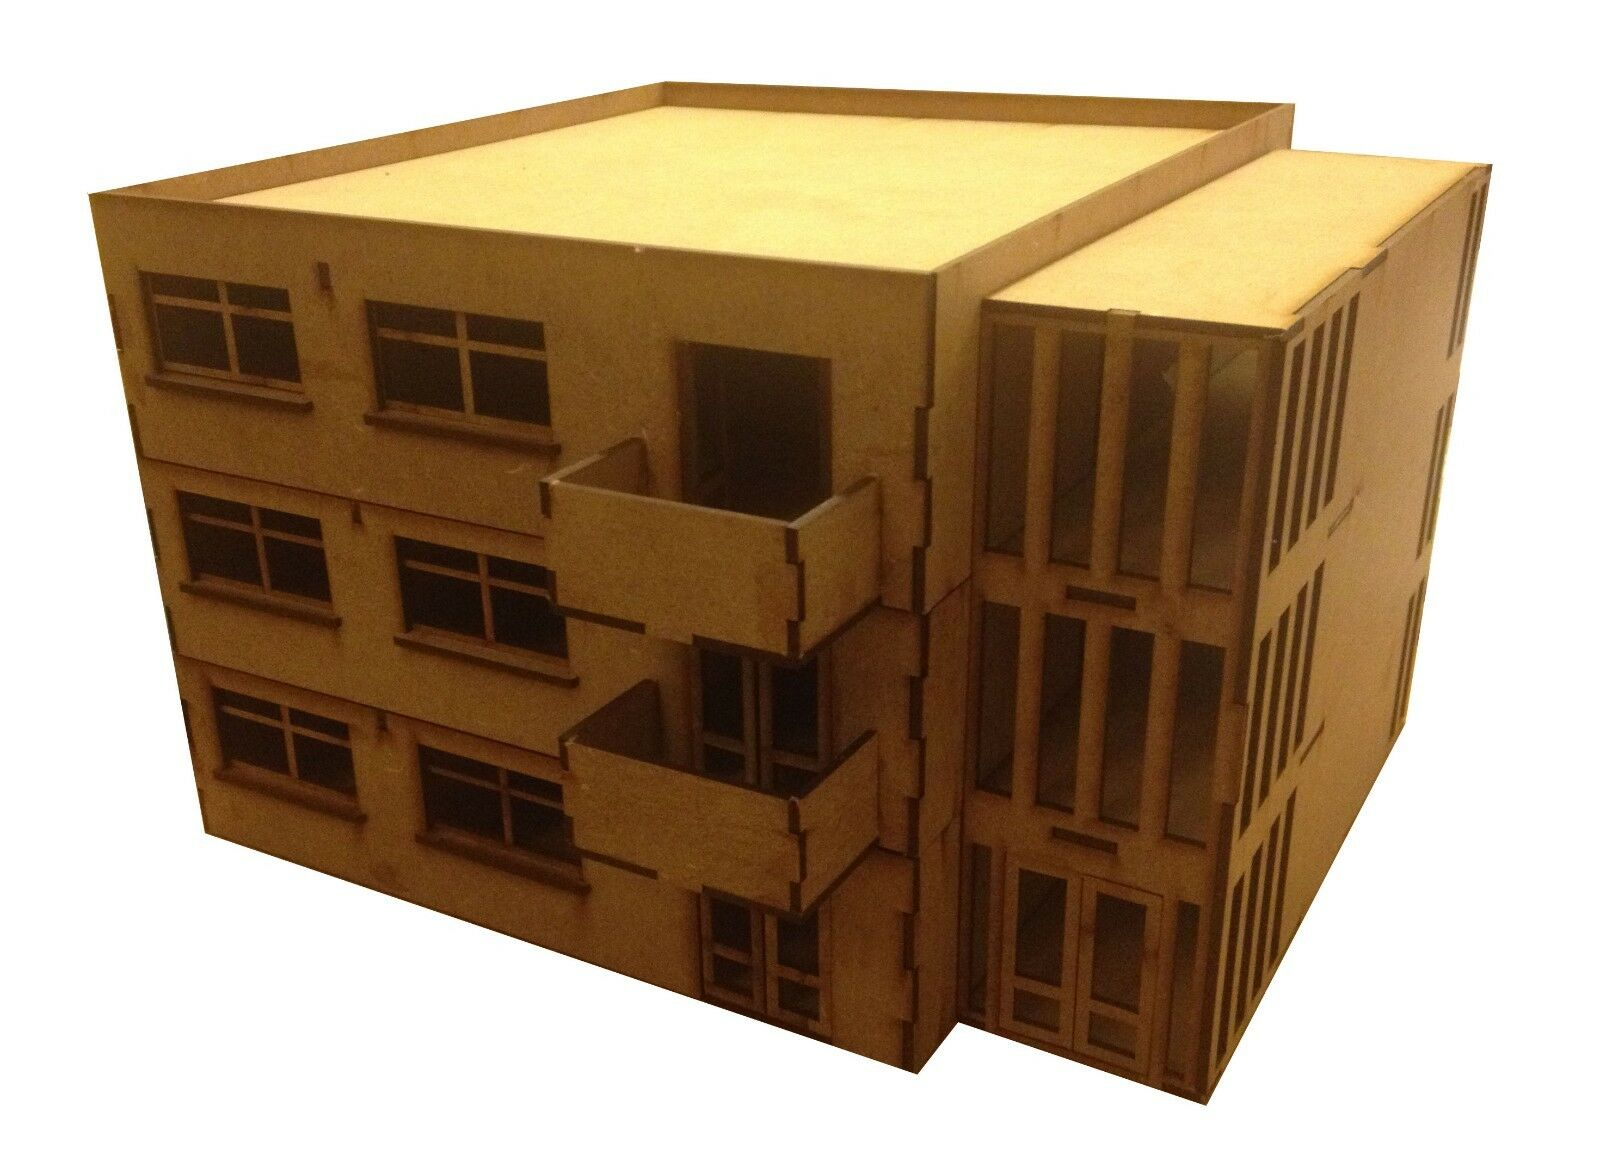 Láser de corte de MDF de 28 mm bloque de apartamentos